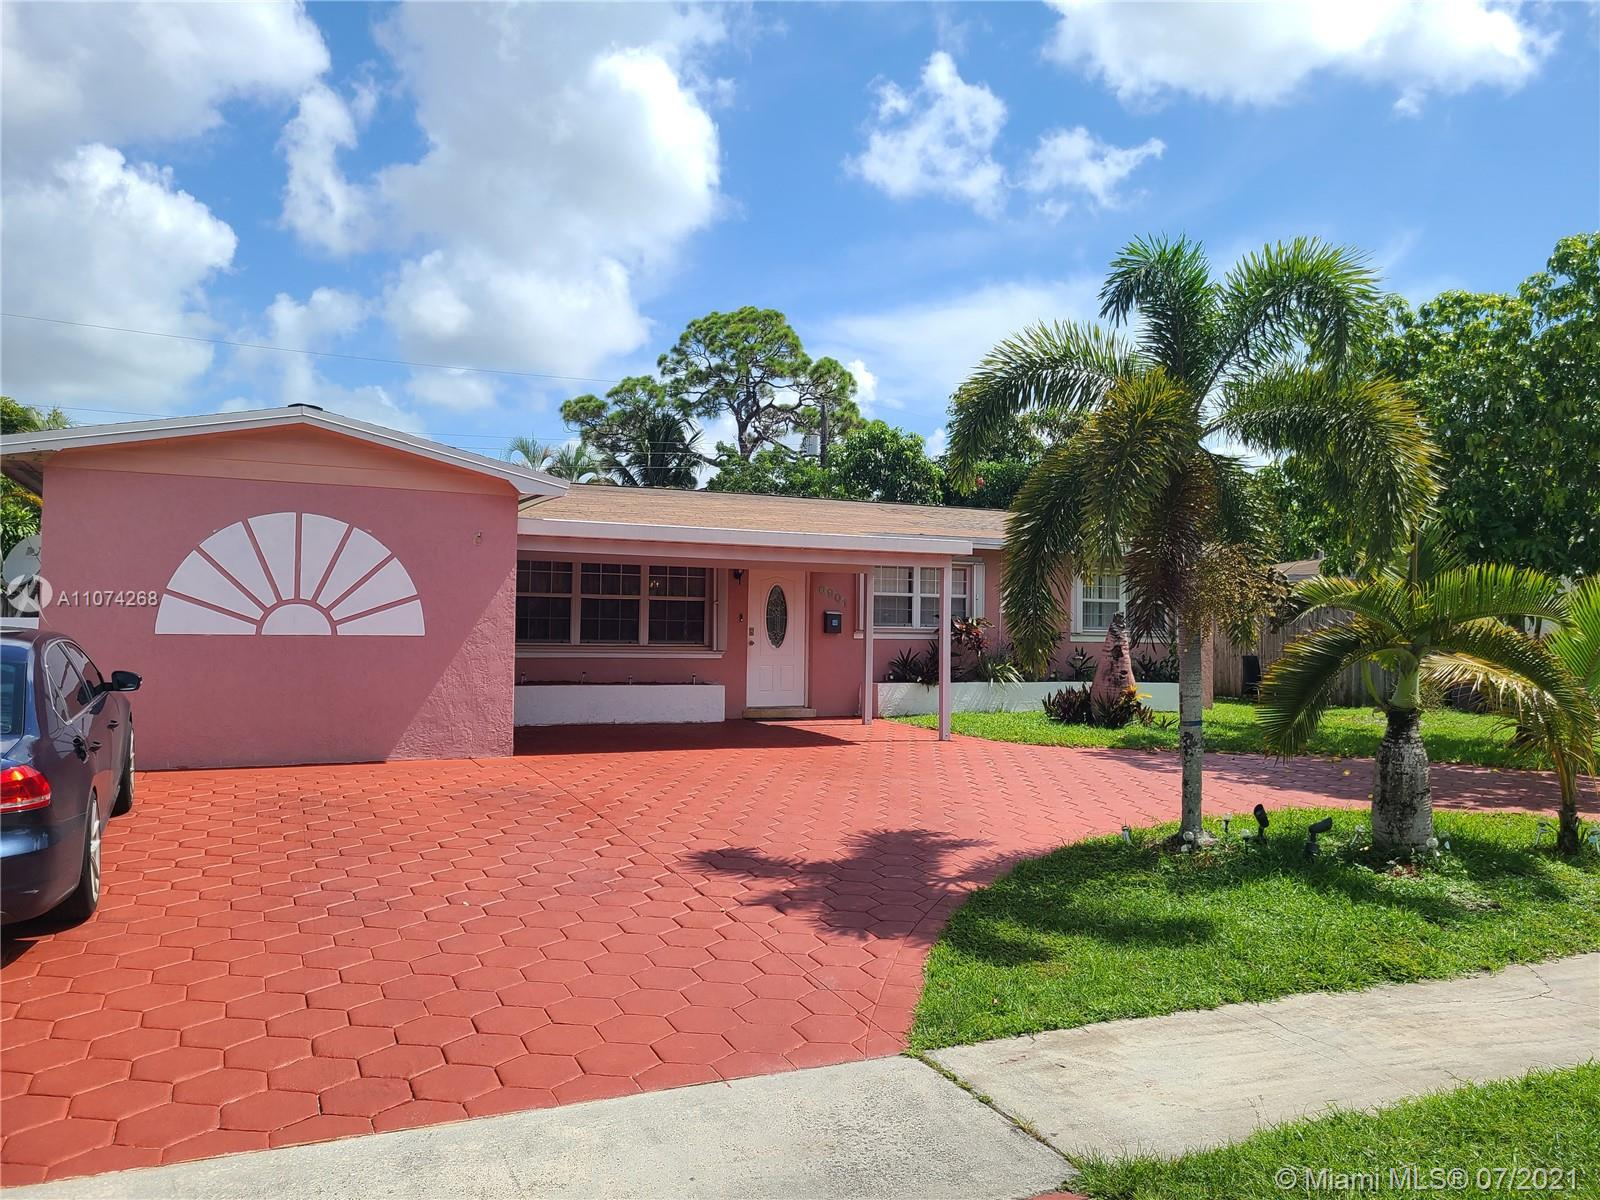 Boulevard Heights - 6901 SW 5th St, Pembroke Pines, FL 33023